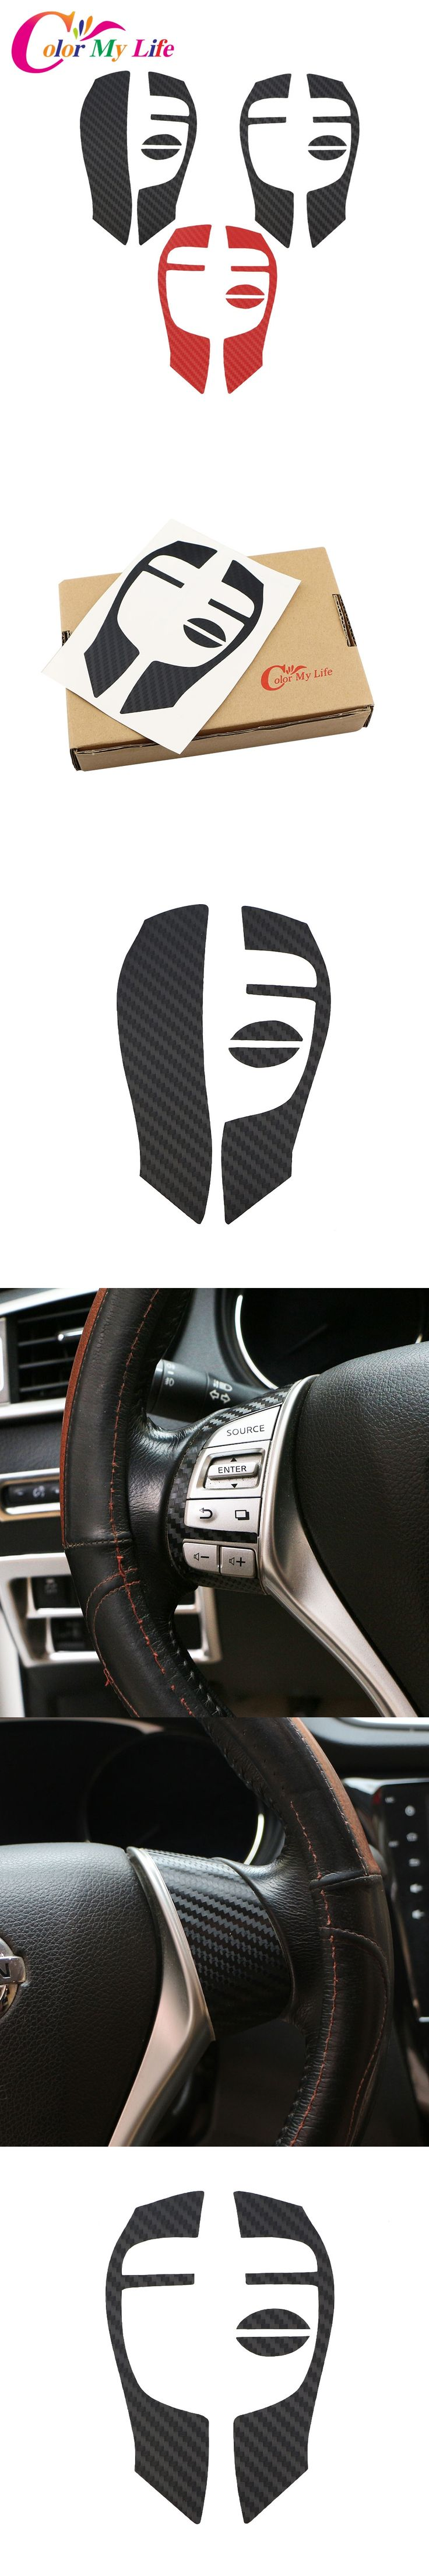 Color my life steering wheel sticker steering wheel logo